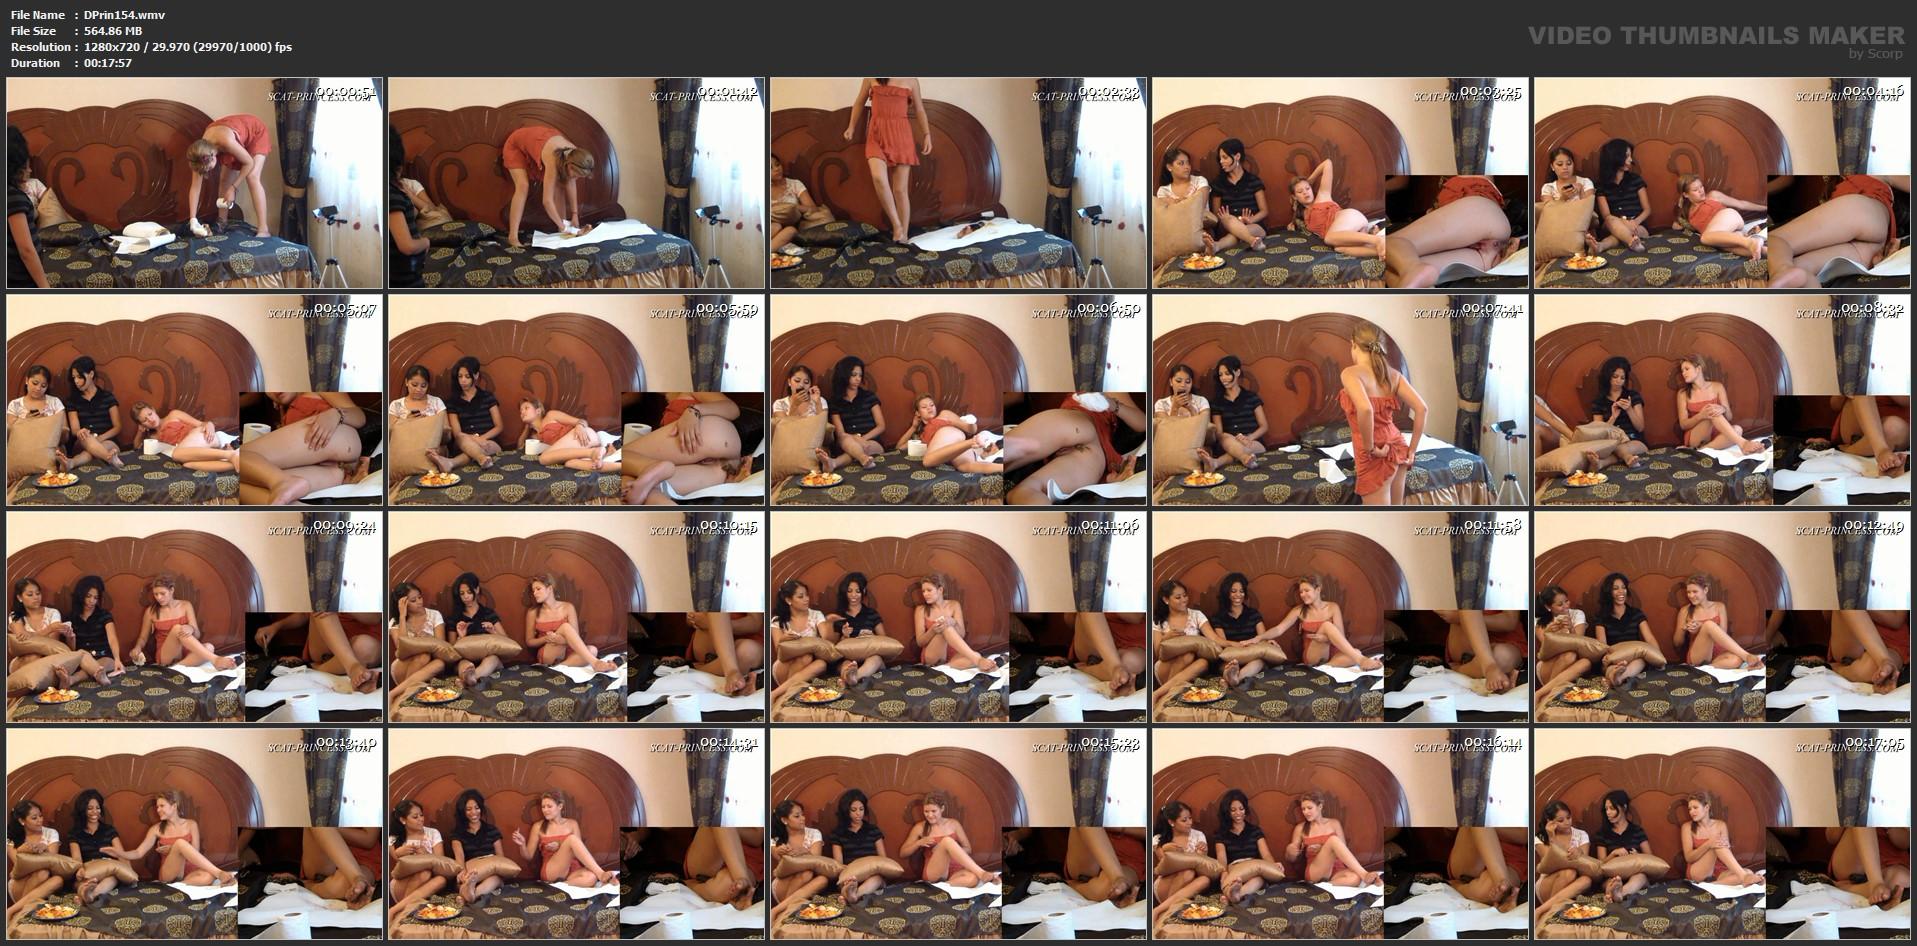 [DOM-PRINCESS] Toilet Slave's Bed Cage Part 3 Merica [HD][720p][WMV]